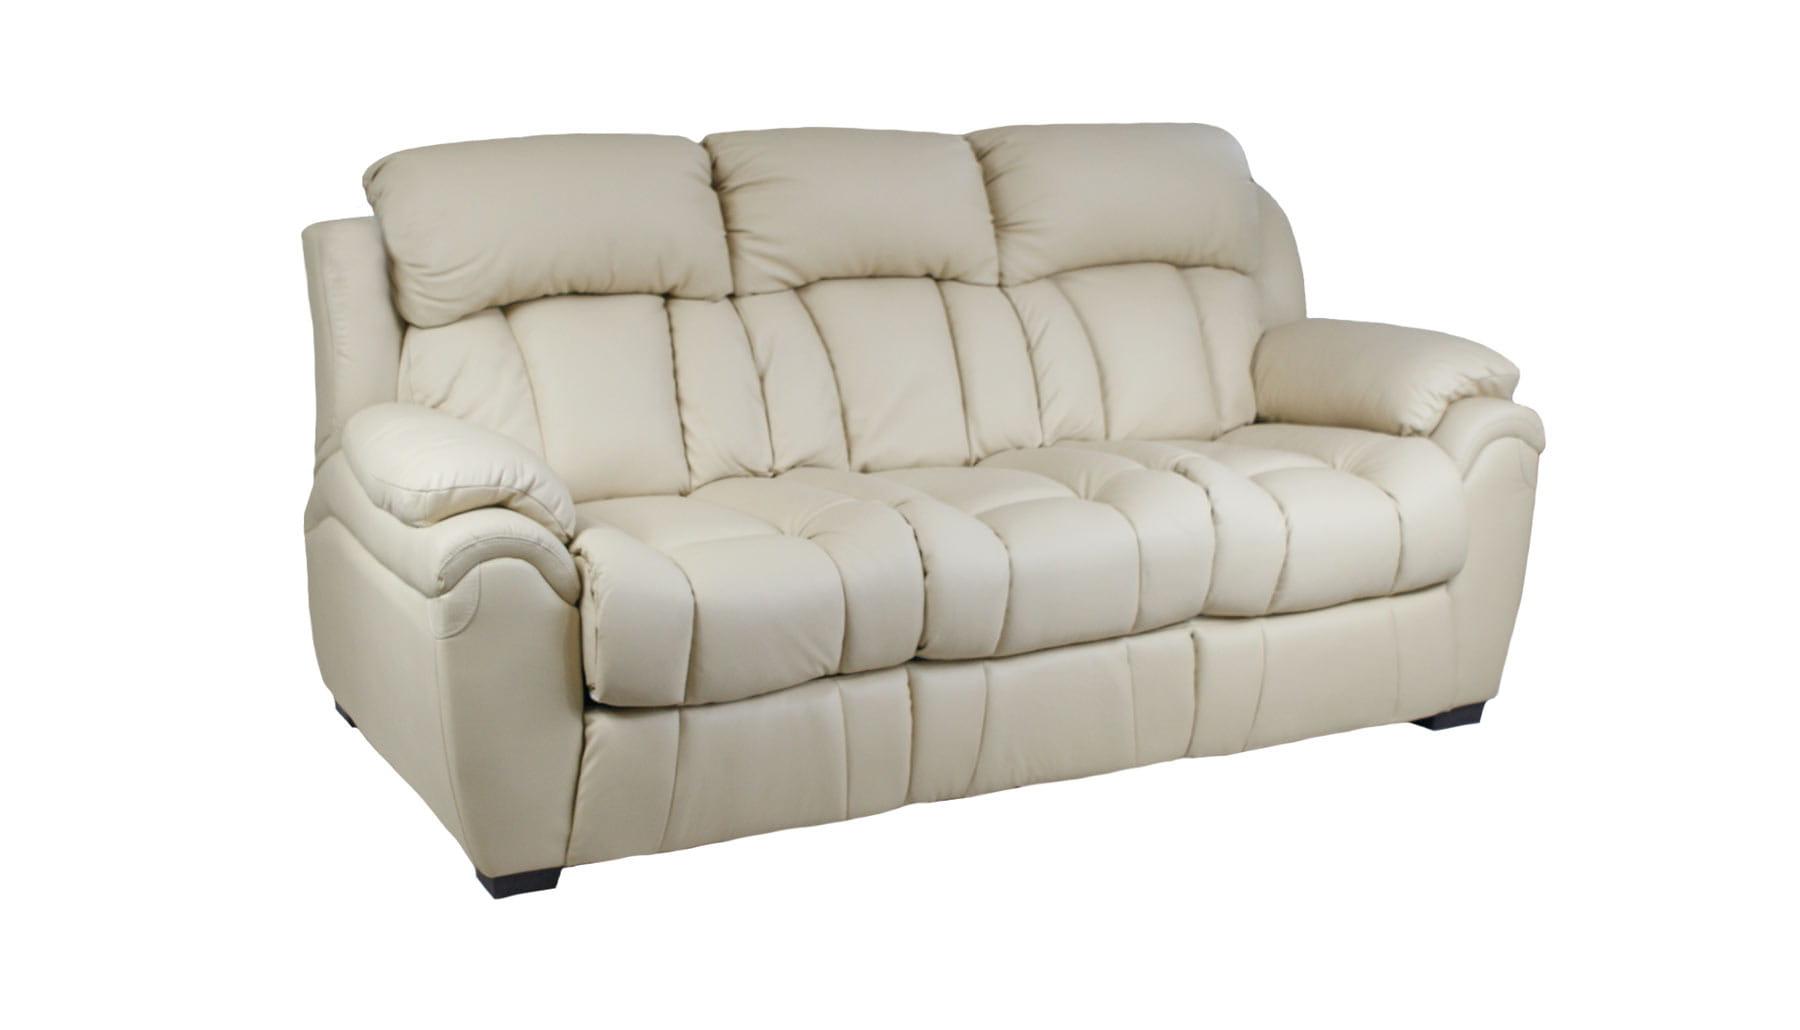 boston sofa sk243rzana 3 osobowa z funkcj� spania � meble